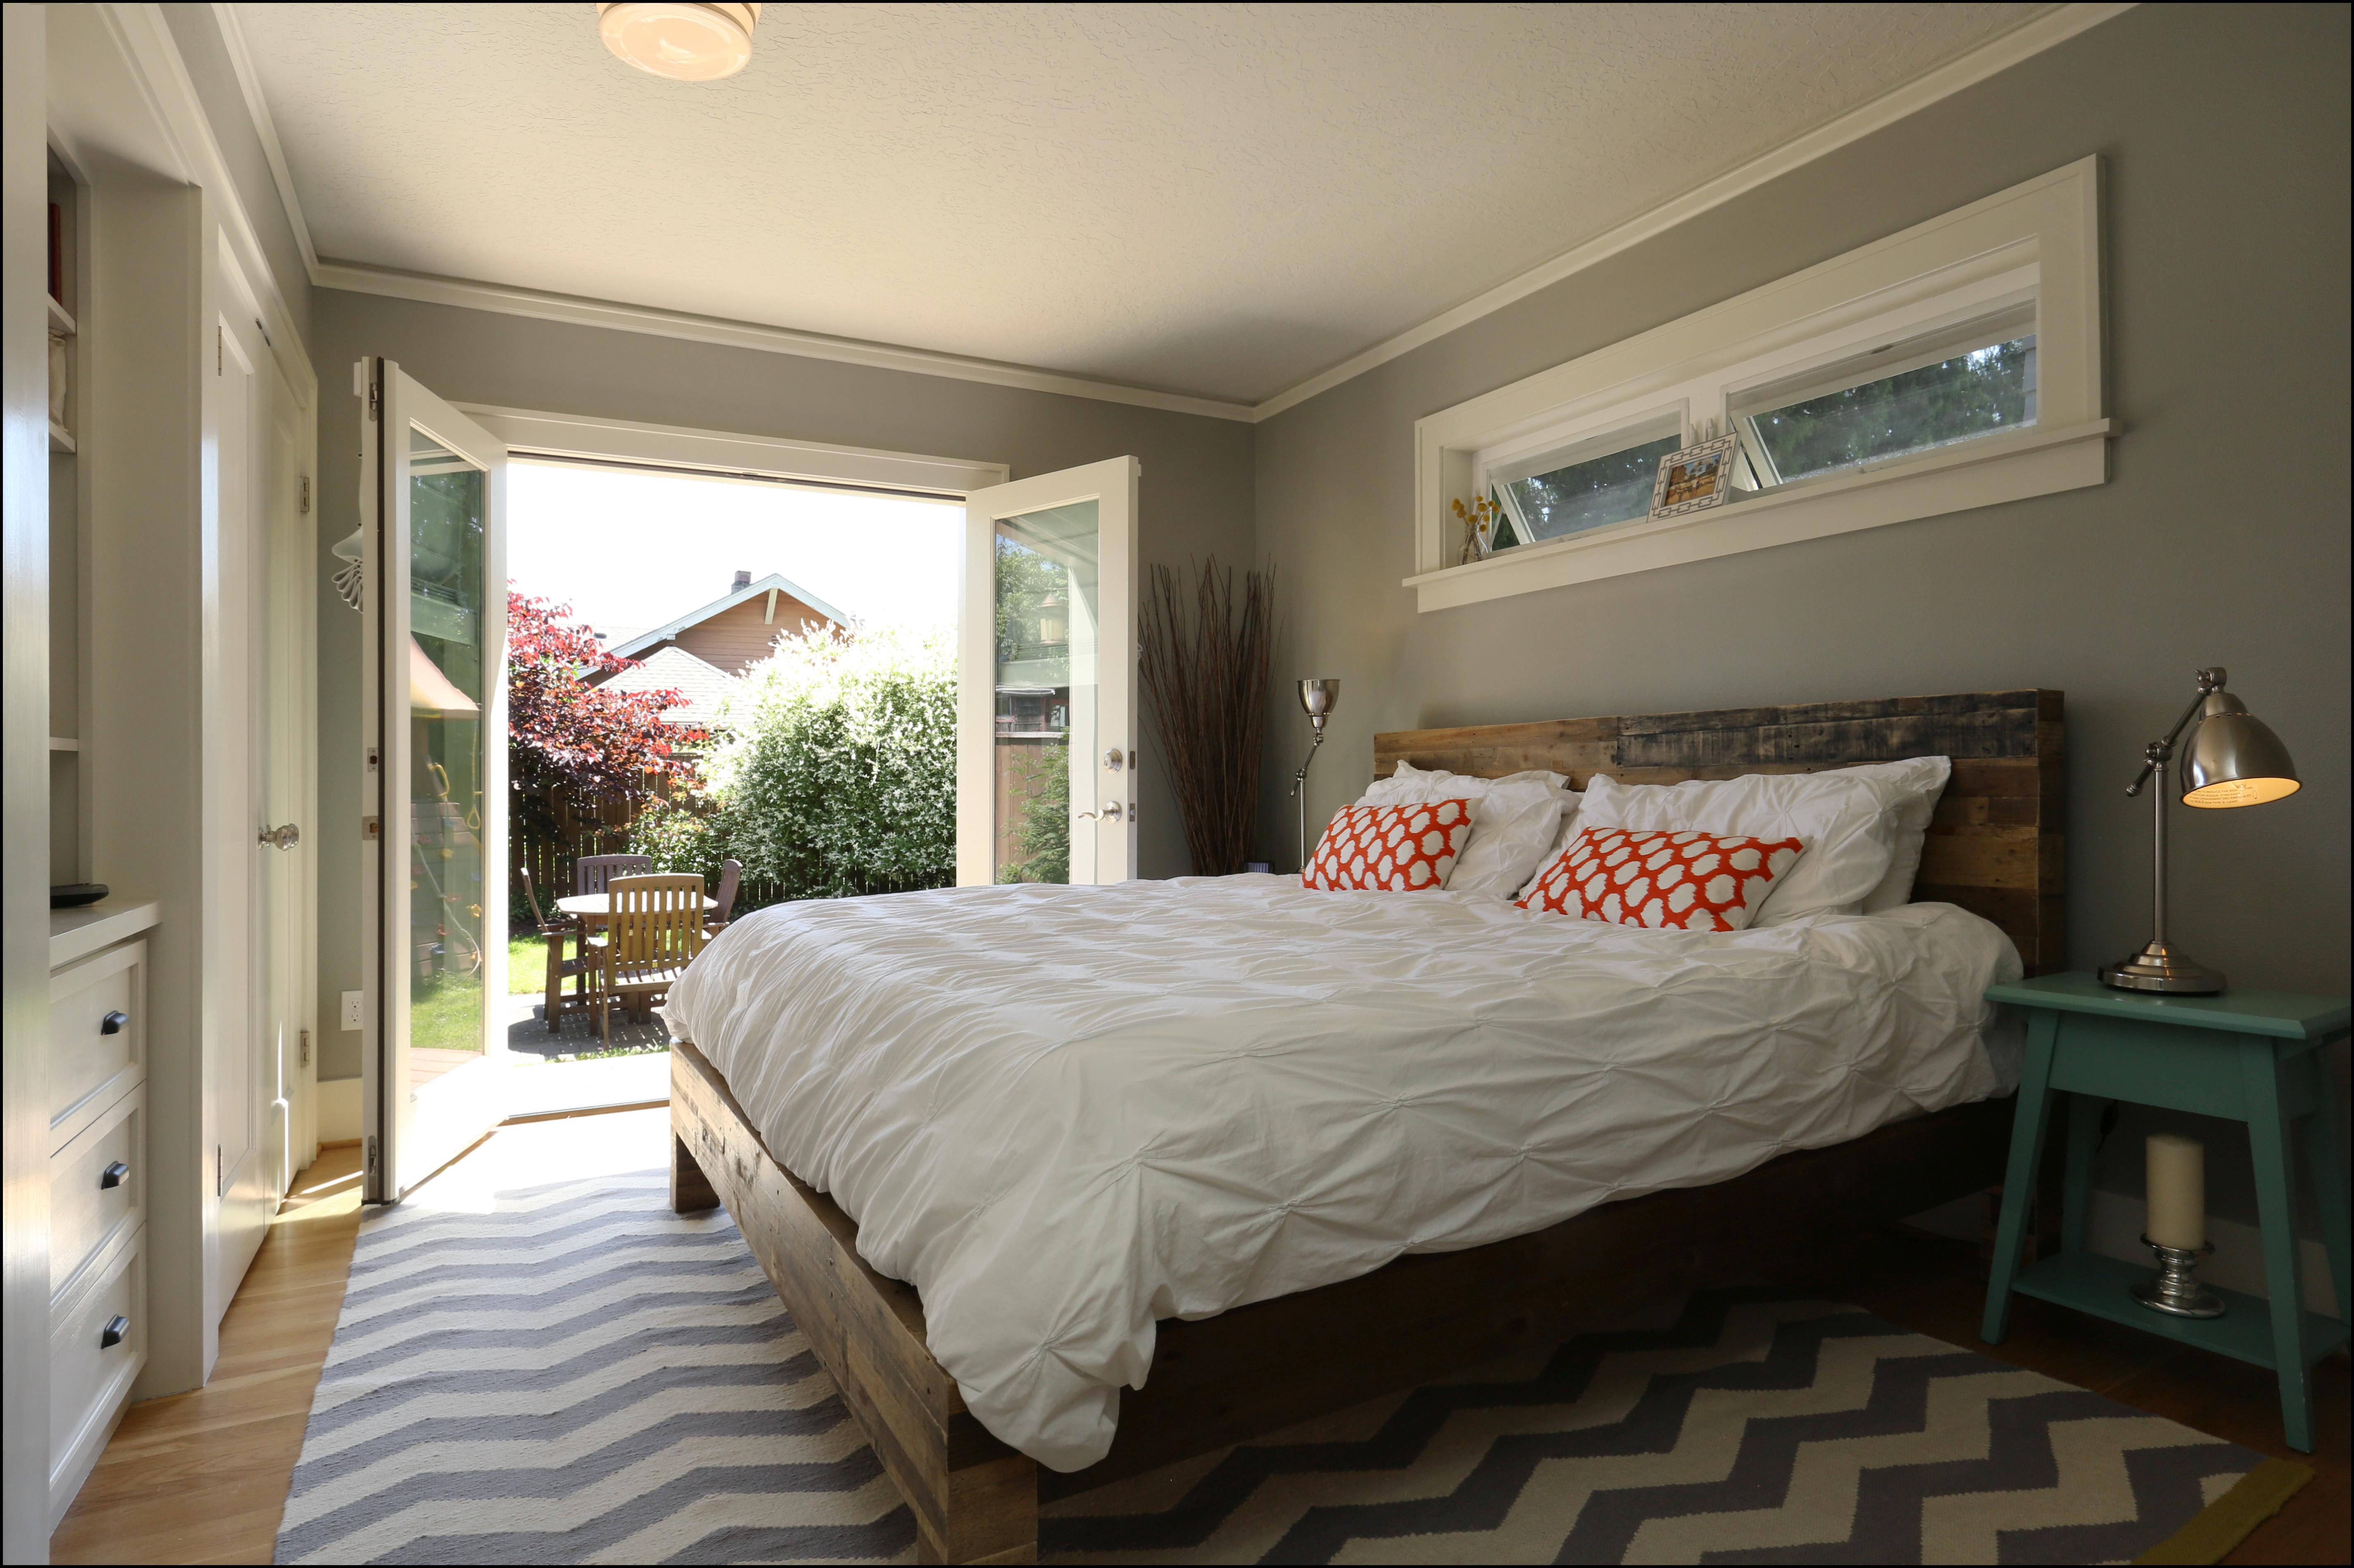 Uncategorized/luxury designer bedding/abernathy - Posts From The Mt Tabor Category